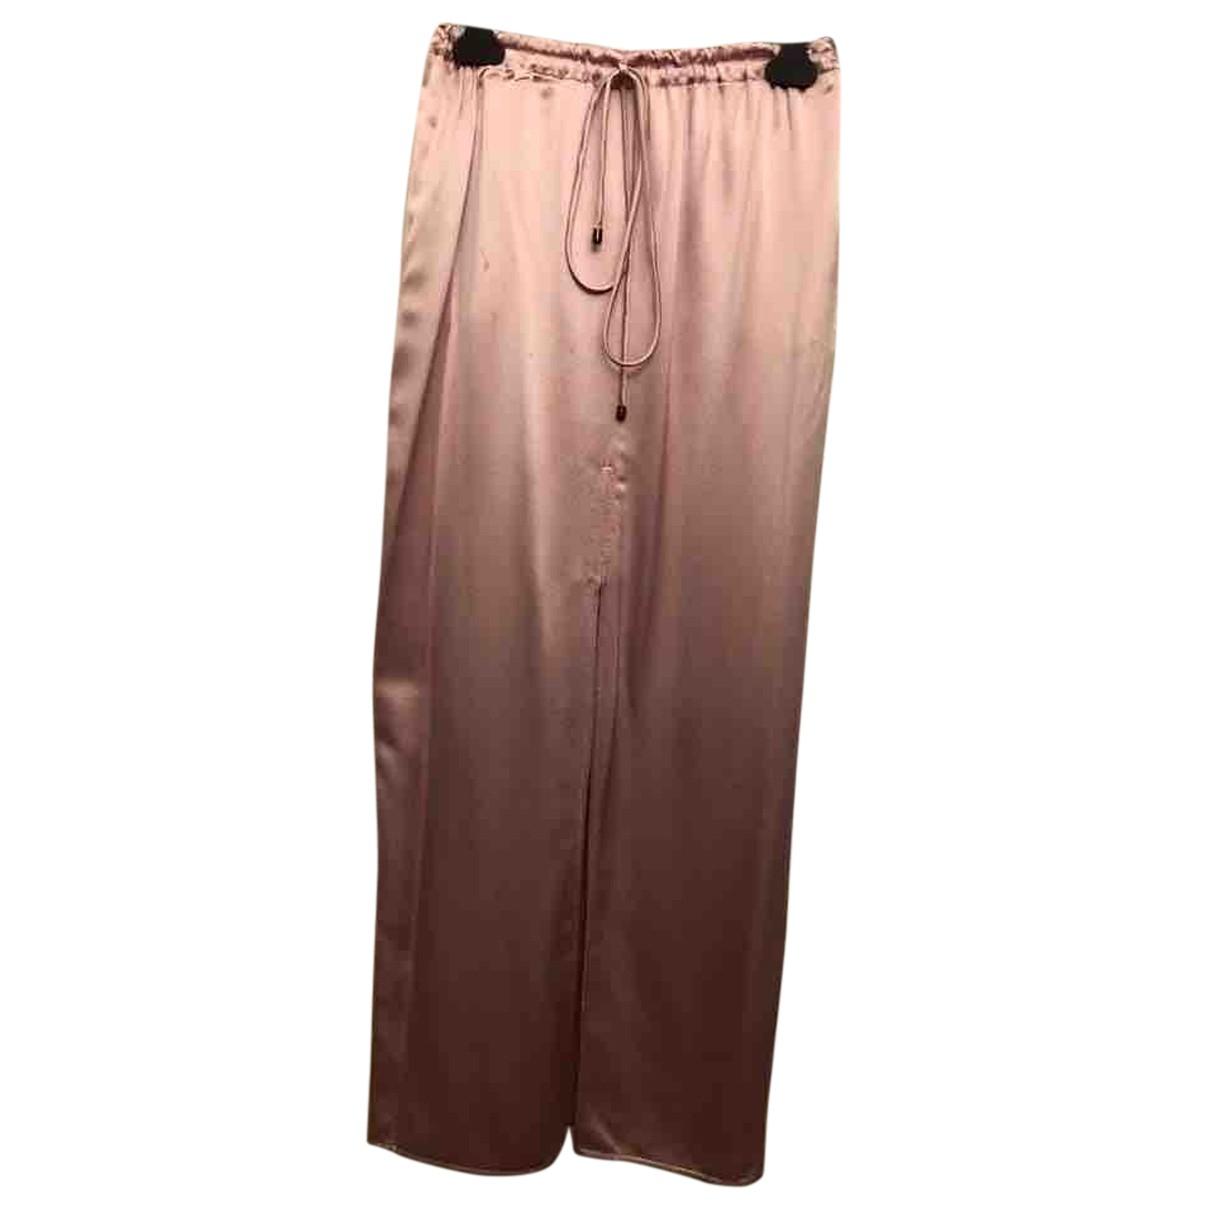 Valentino Garavani N Pink Silk skirt for Women 6 US